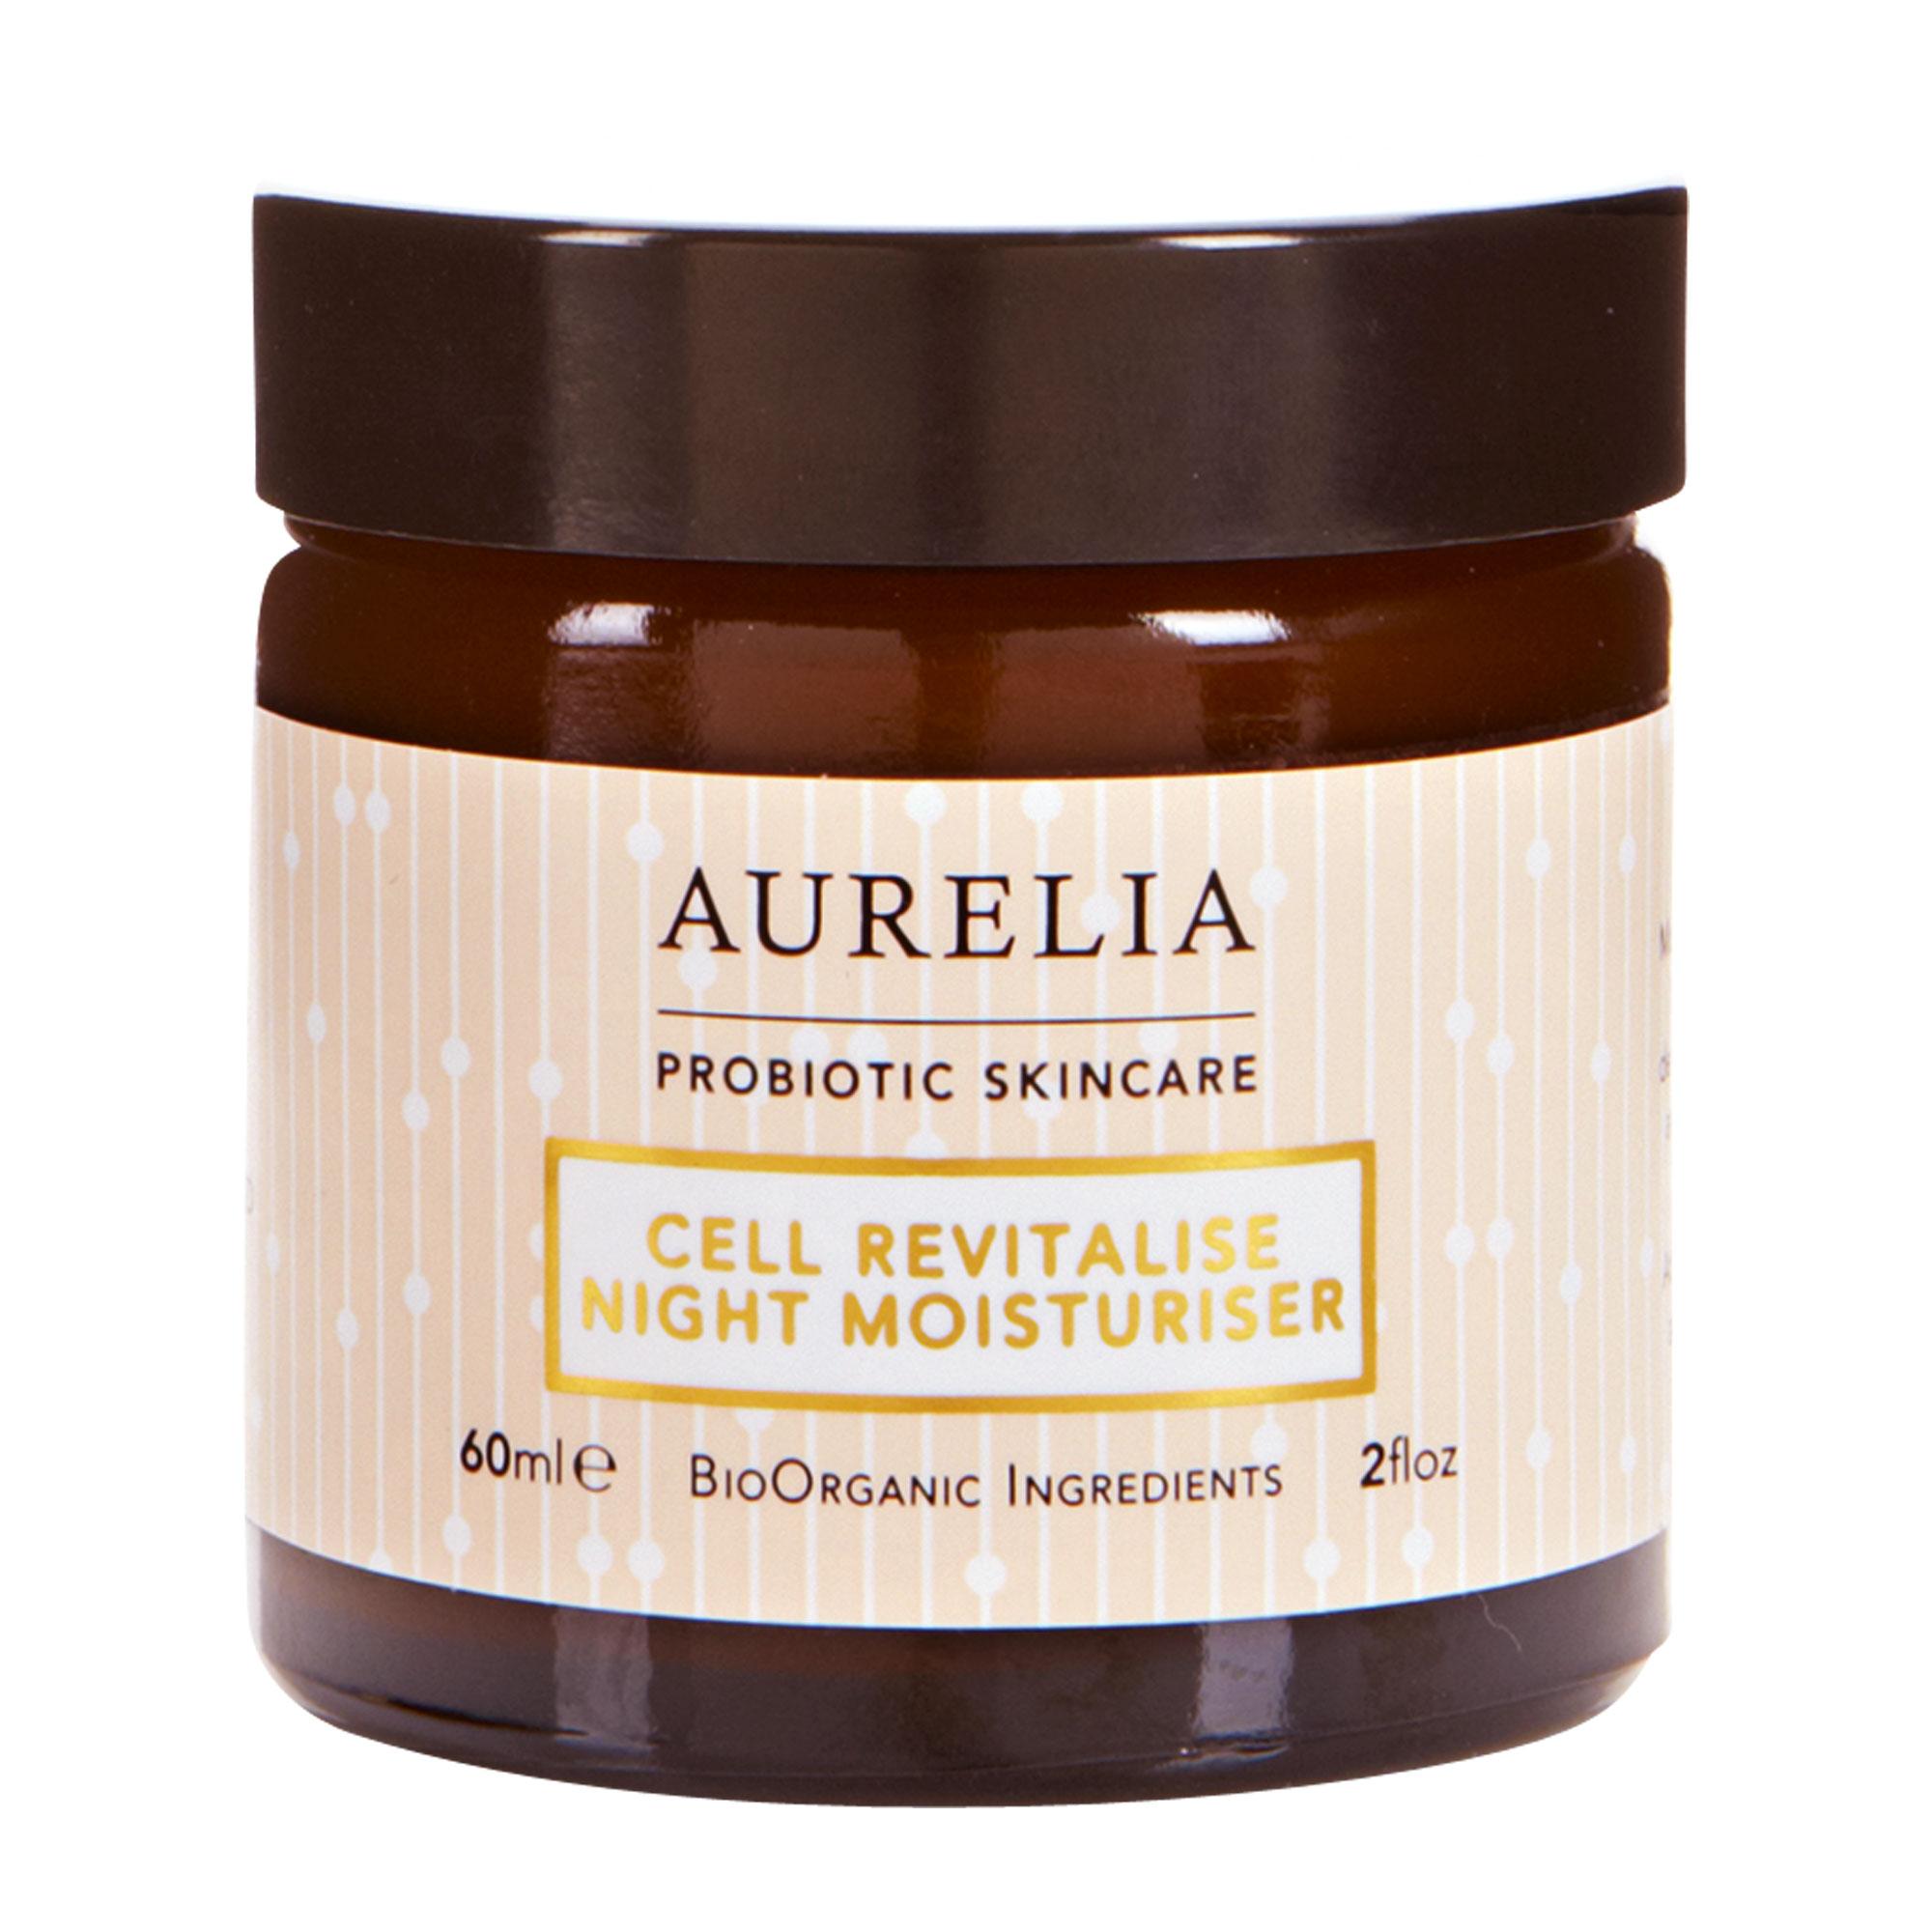 Aurelia Cell Revitalise Night Moisturiser, 60 ml